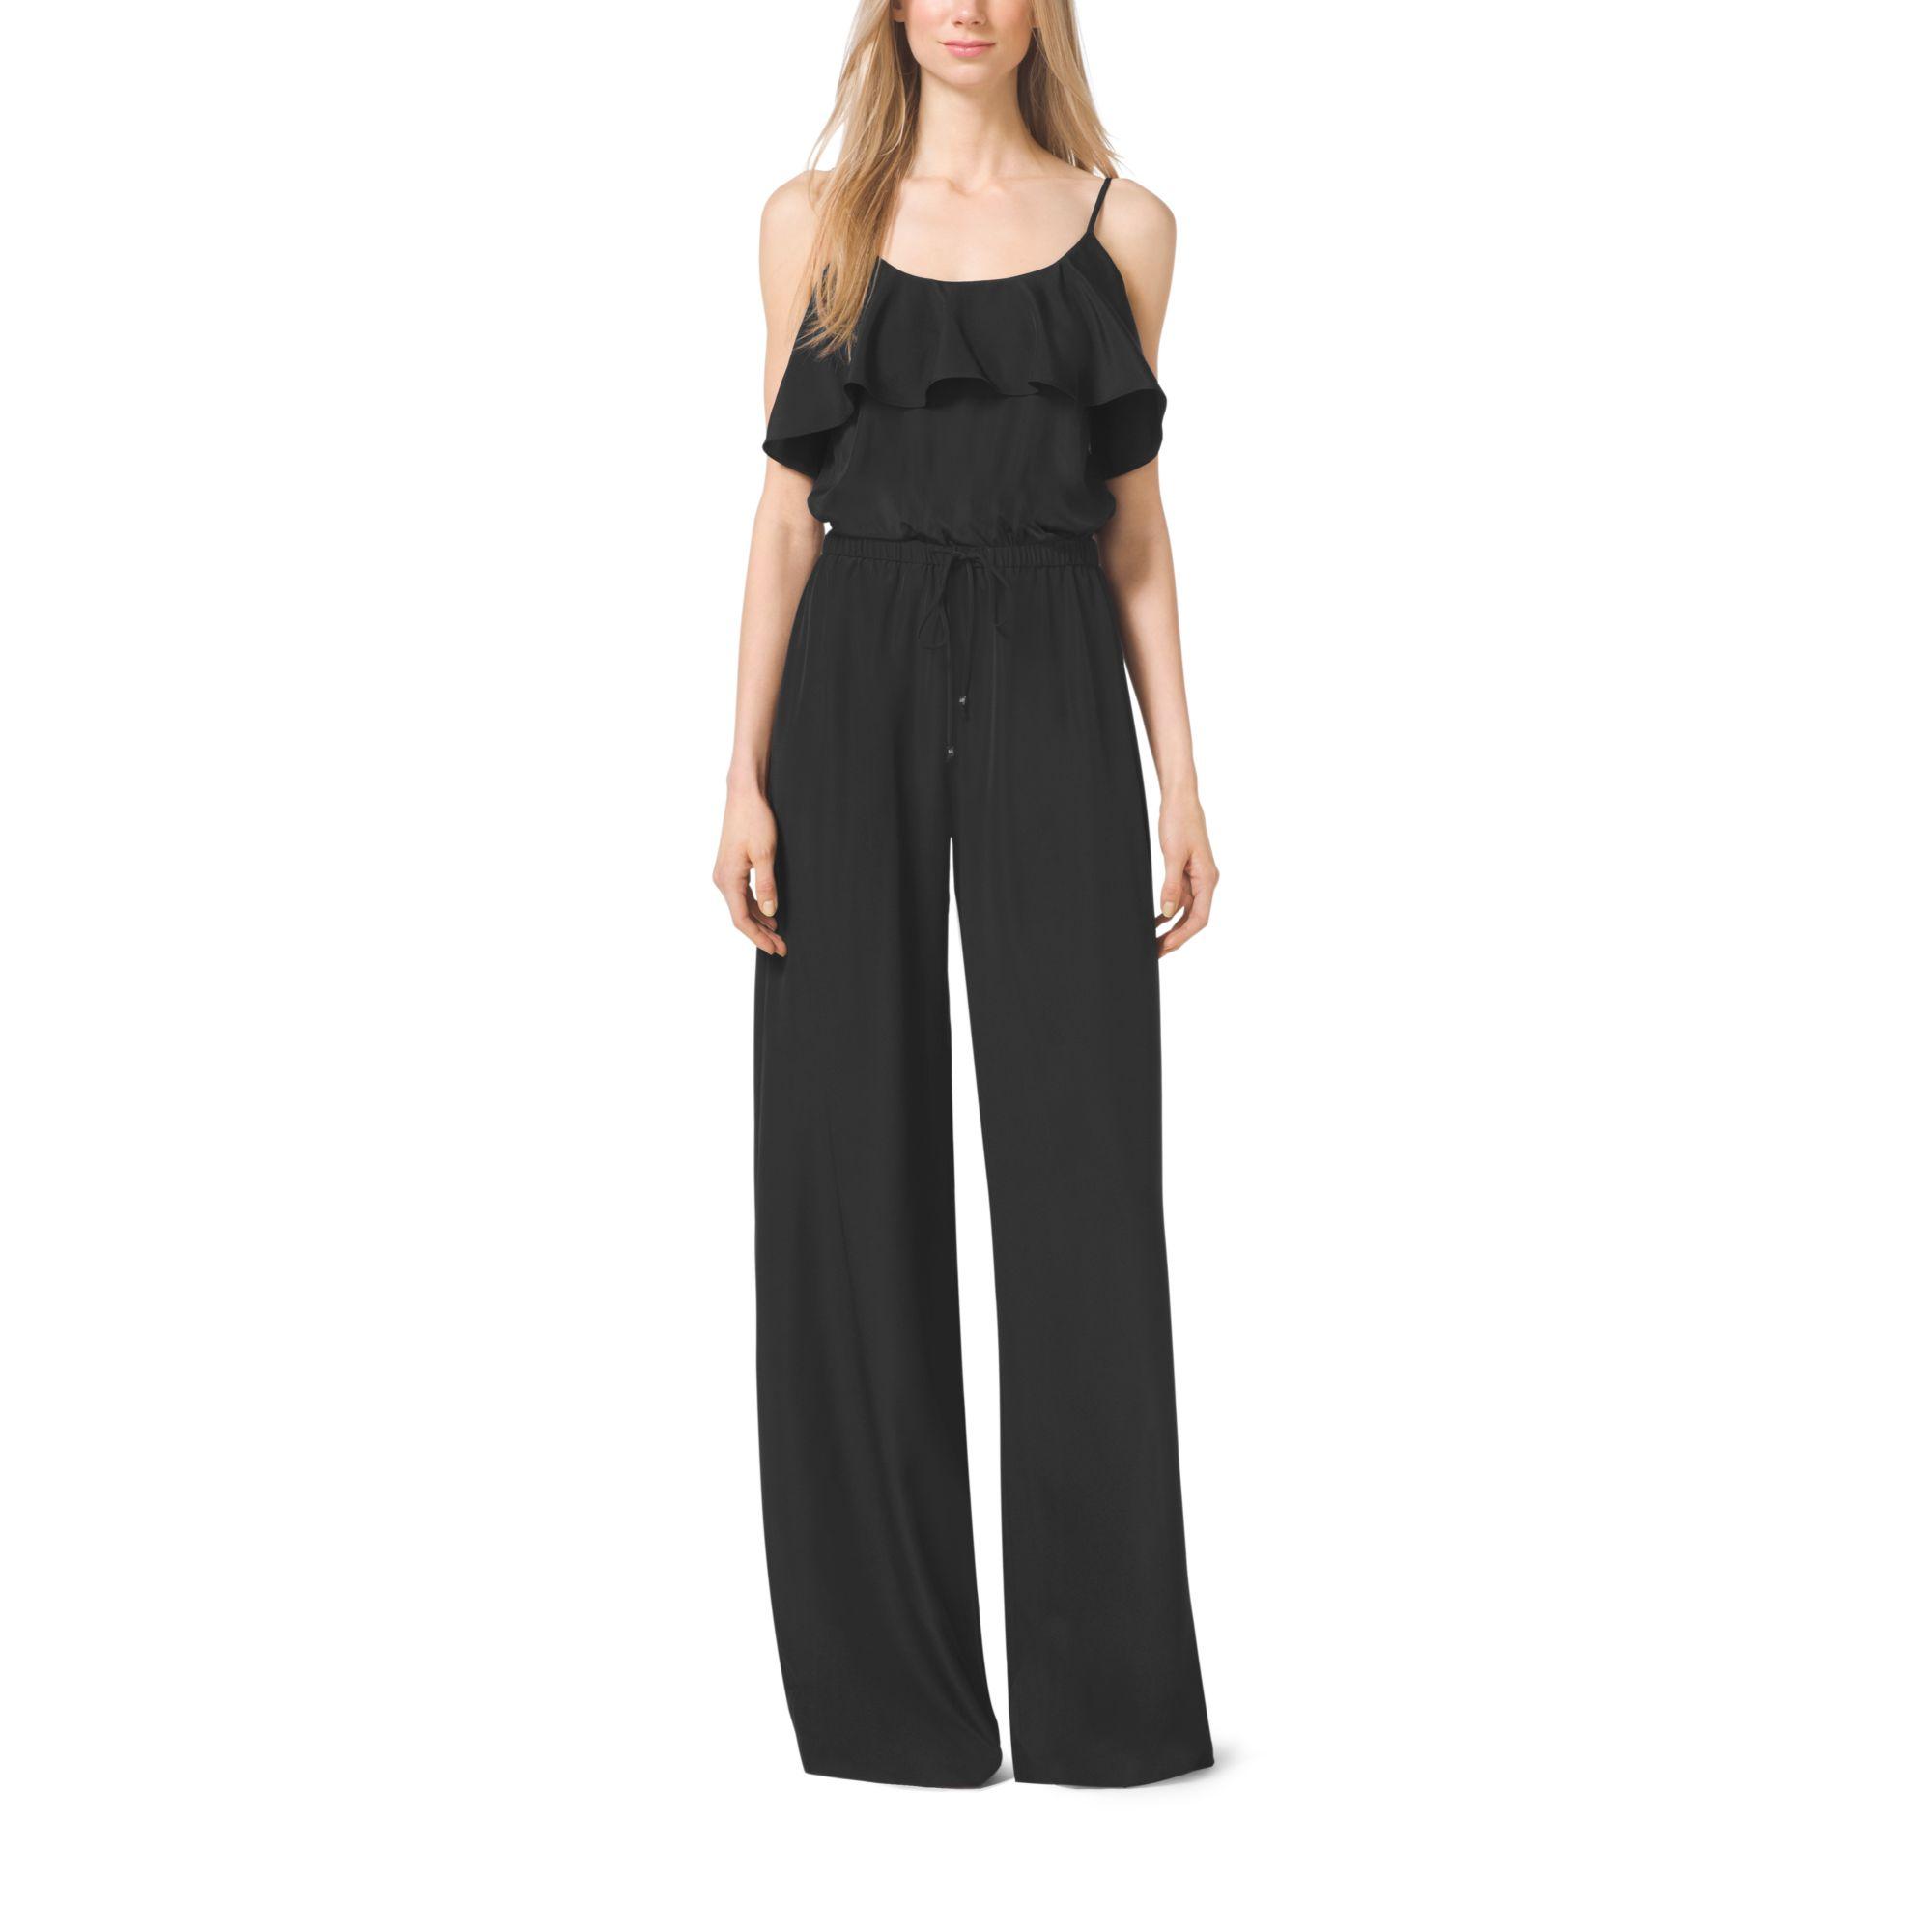 michael kors flounce crepe jumpsuit in black lyst. Black Bedroom Furniture Sets. Home Design Ideas